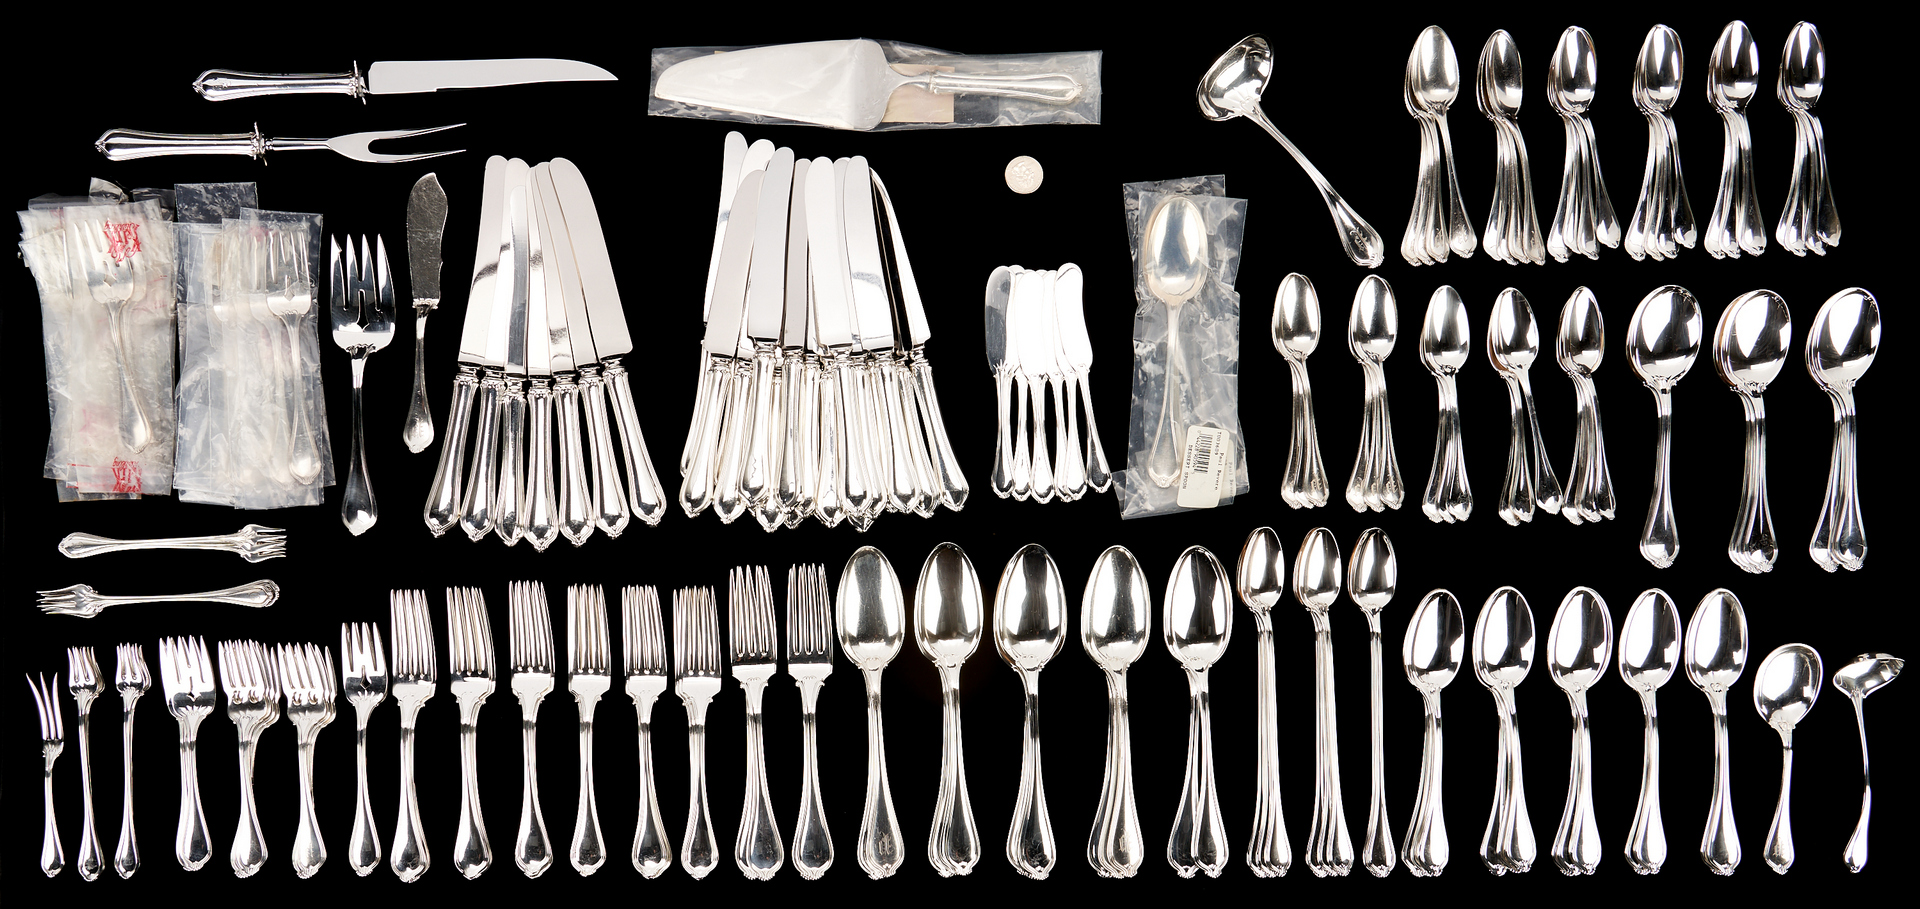 Lot 81: 191 Pcs. Towle Paul Revere Pattern Sterling Silver Flatware